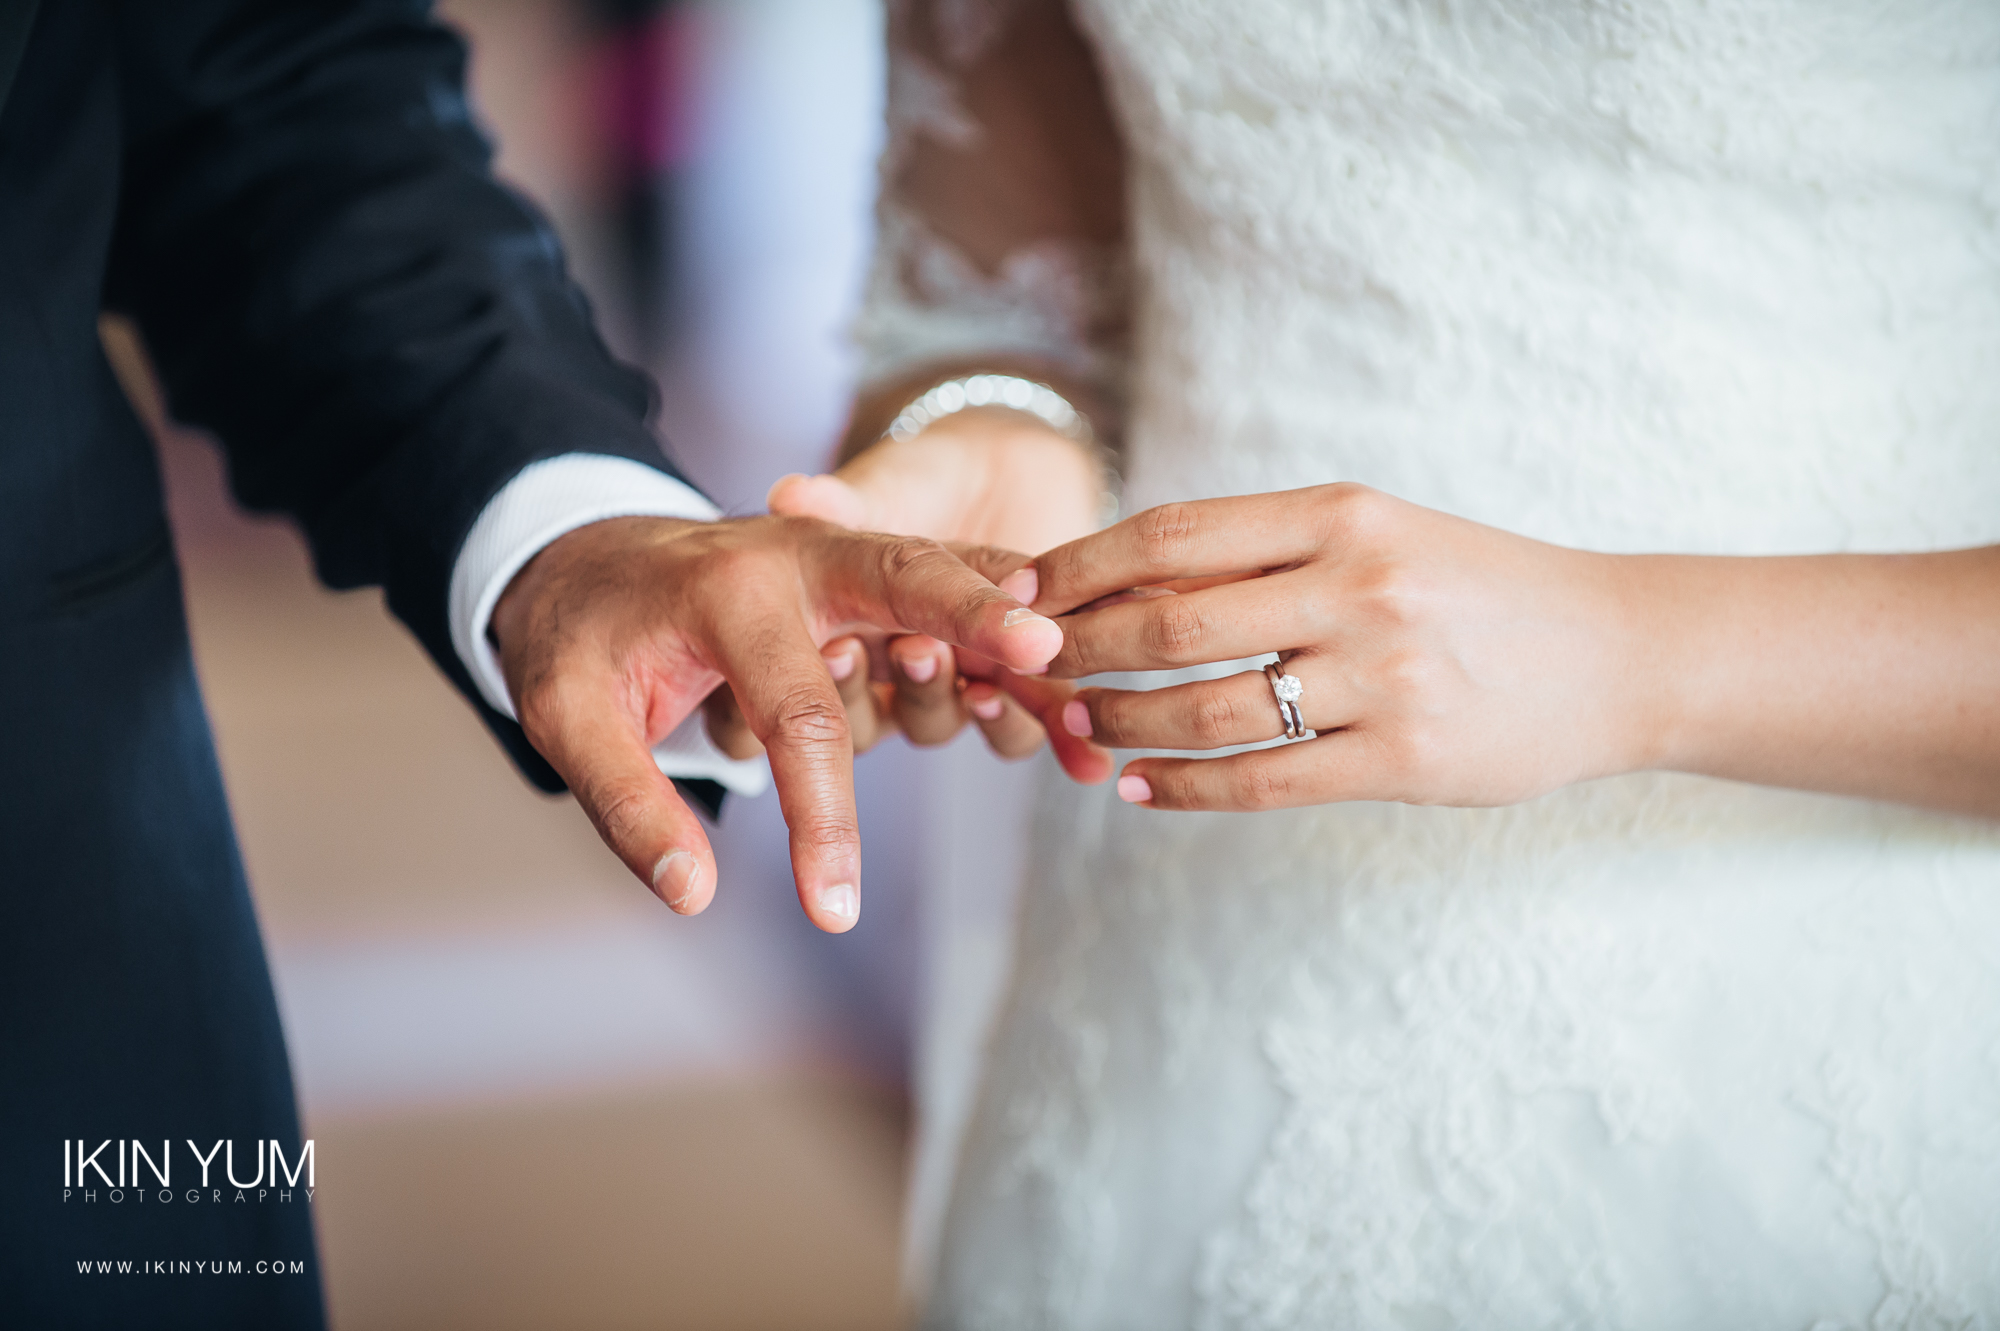 Laura Ashley Manor Wedding - Ikin Yum Photography-059.jpg